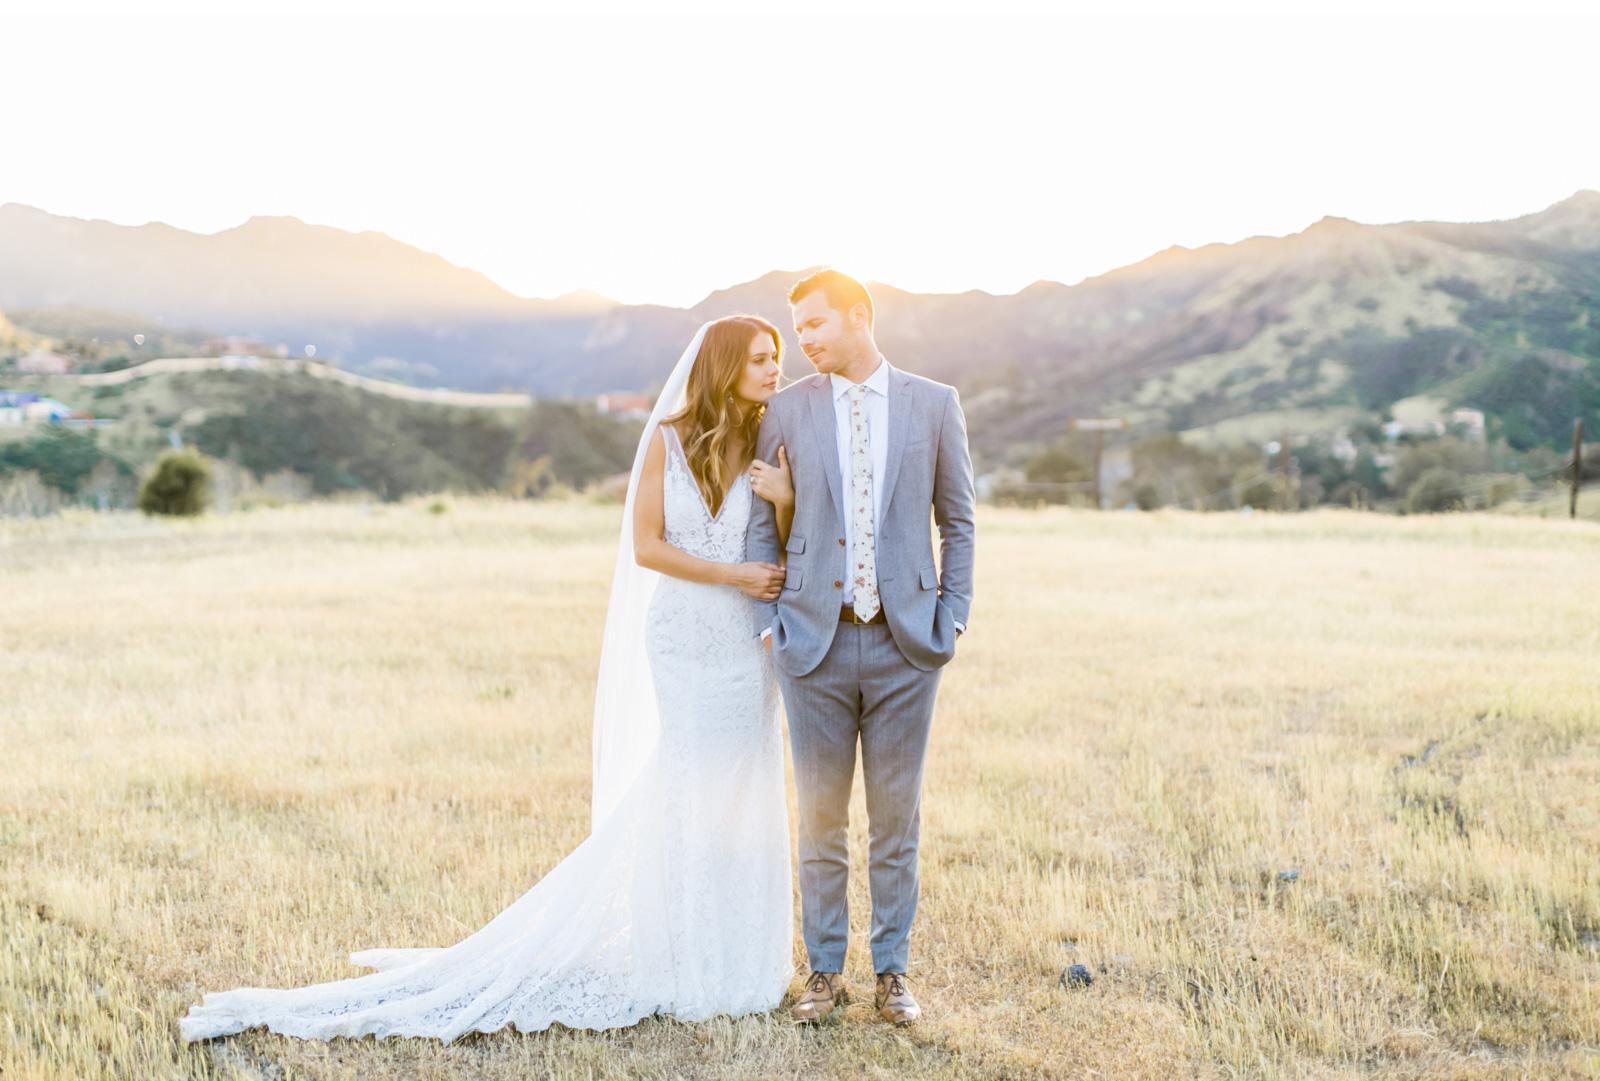 Triunfo-Creek-Malibu-Wedding-Photographer-Natalie-Schutt-Photography_13.jpg